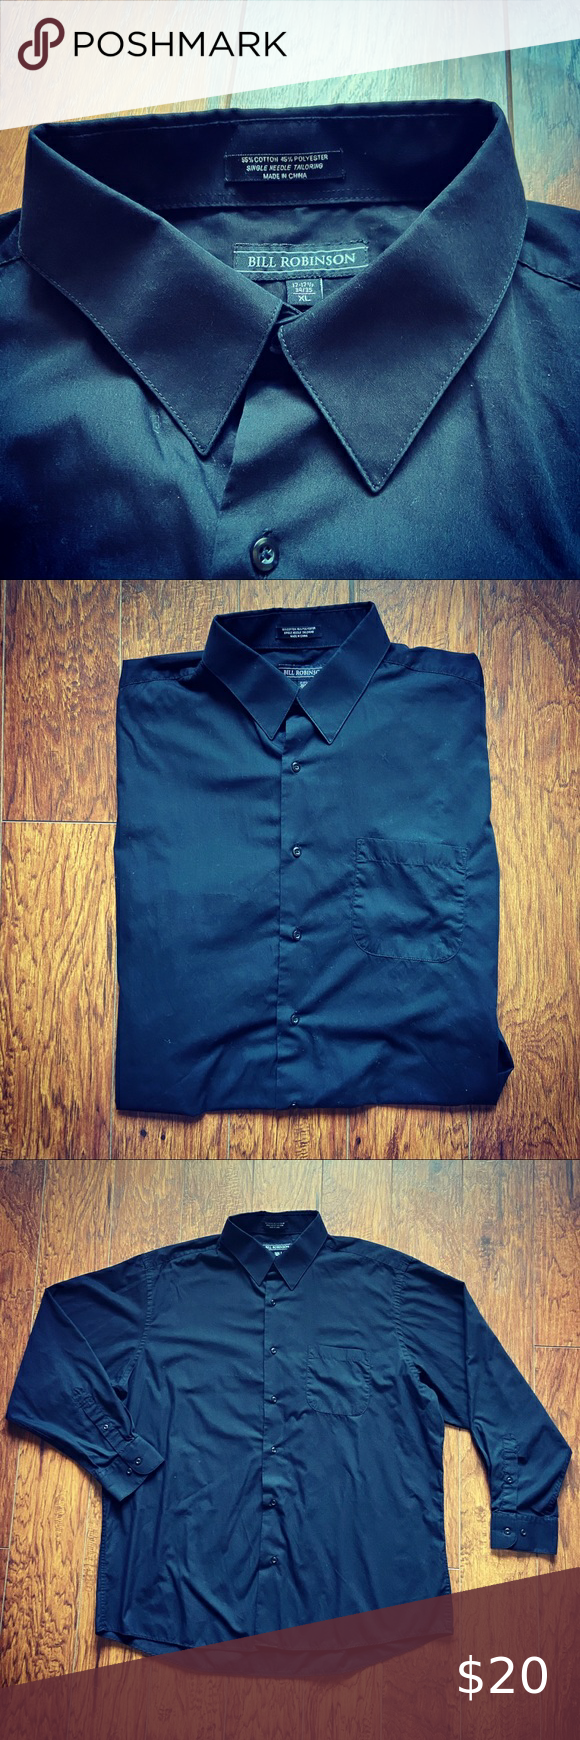 Bill Robinson Button Down Dress Shirt Black Dress Shirt Excellent Condition Size 17 17 1 2 34 35 Bill Robinson Sh Black Shirt Dress Mens Shirt Dress Shirts [ 1740 x 580 Pixel ]